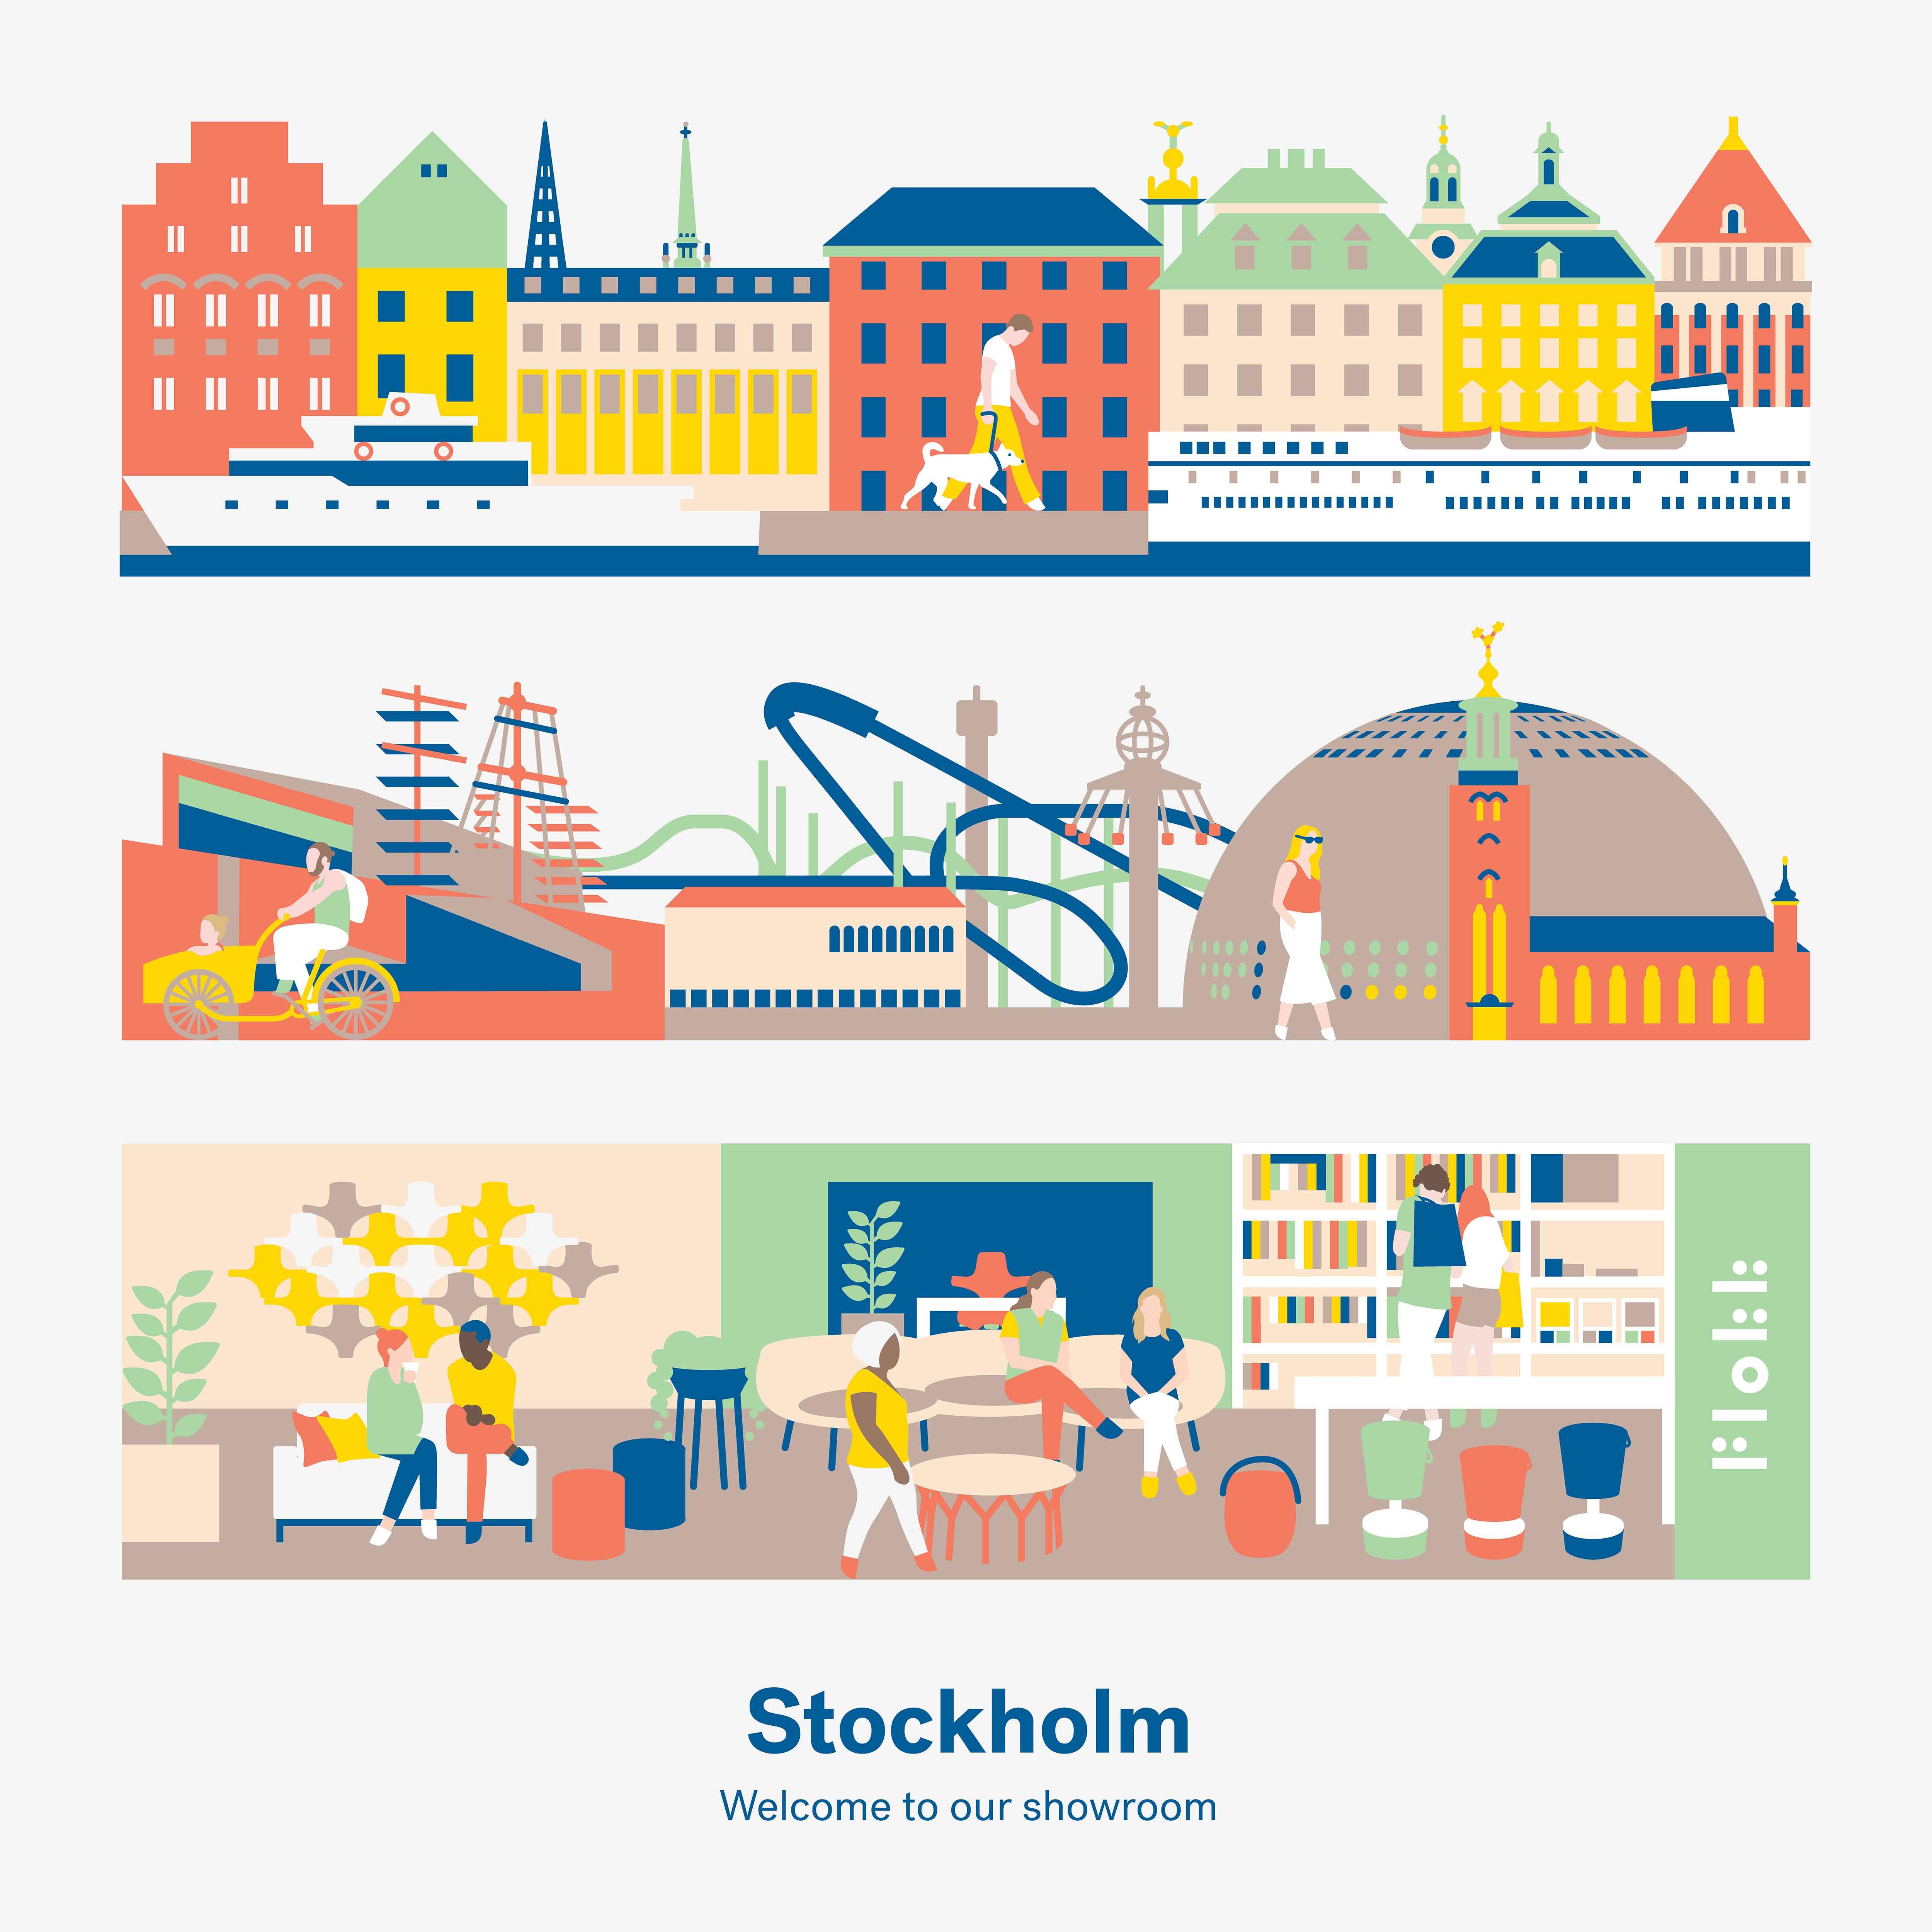 FLOKK_Stockholm_small